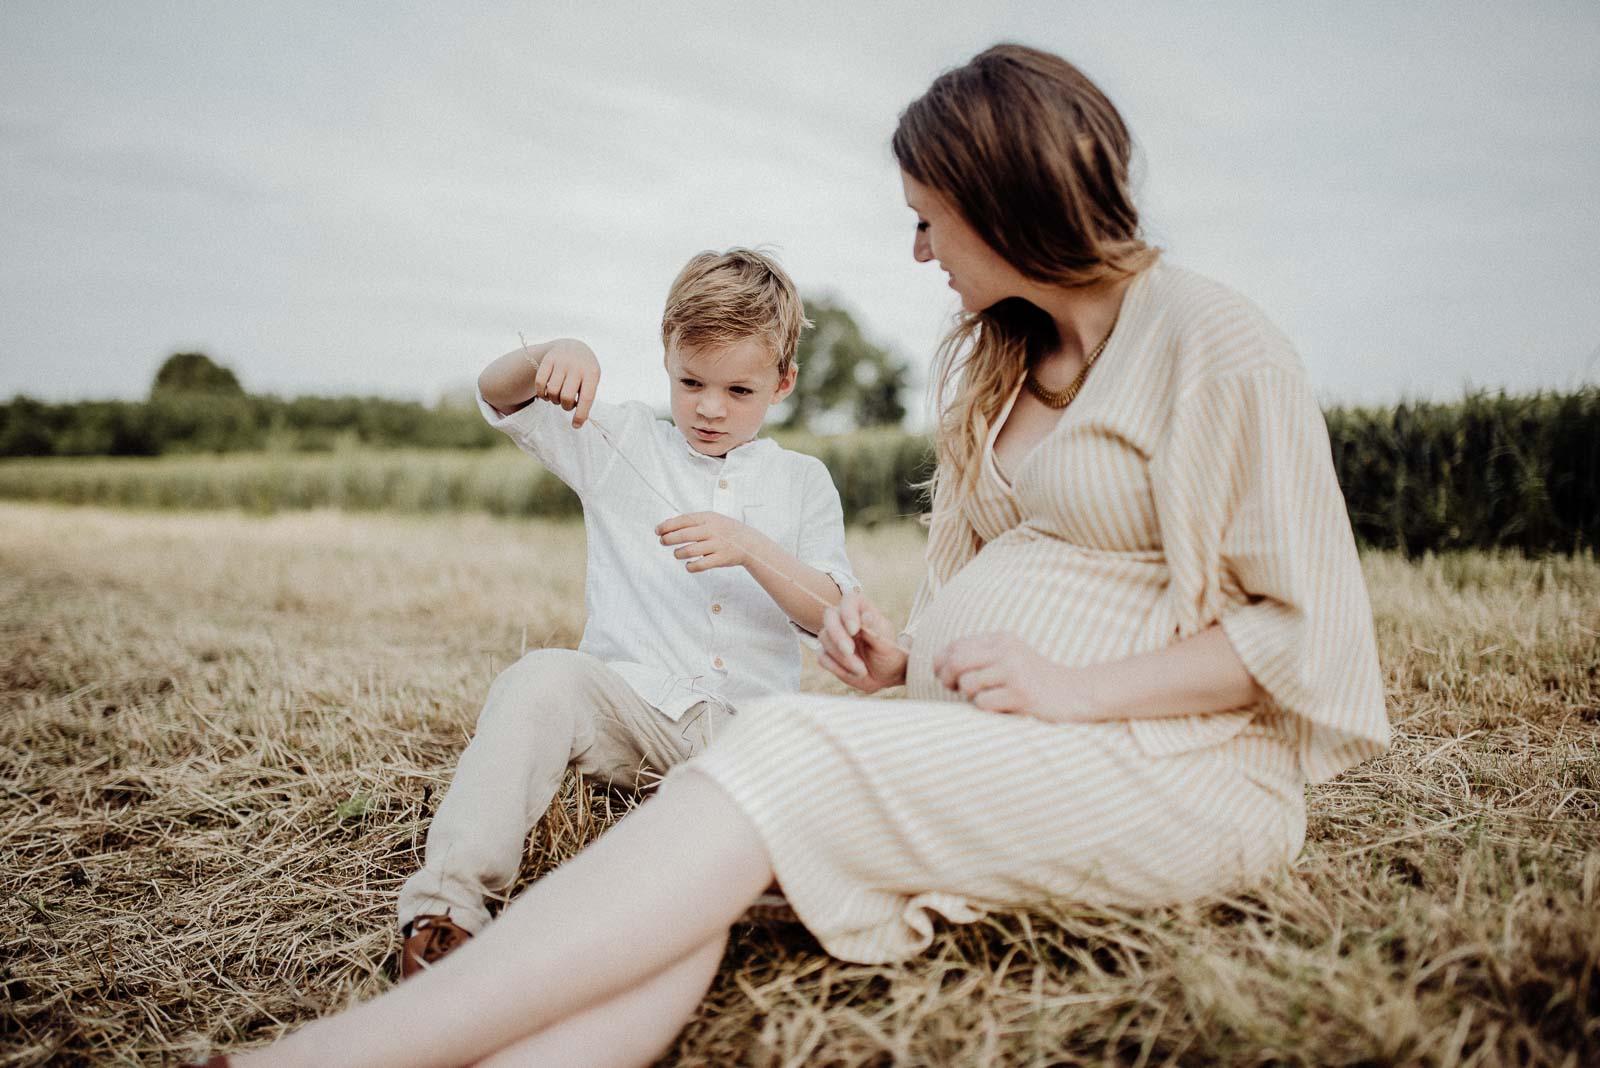 039-familien-fotoshooting-herne-heide